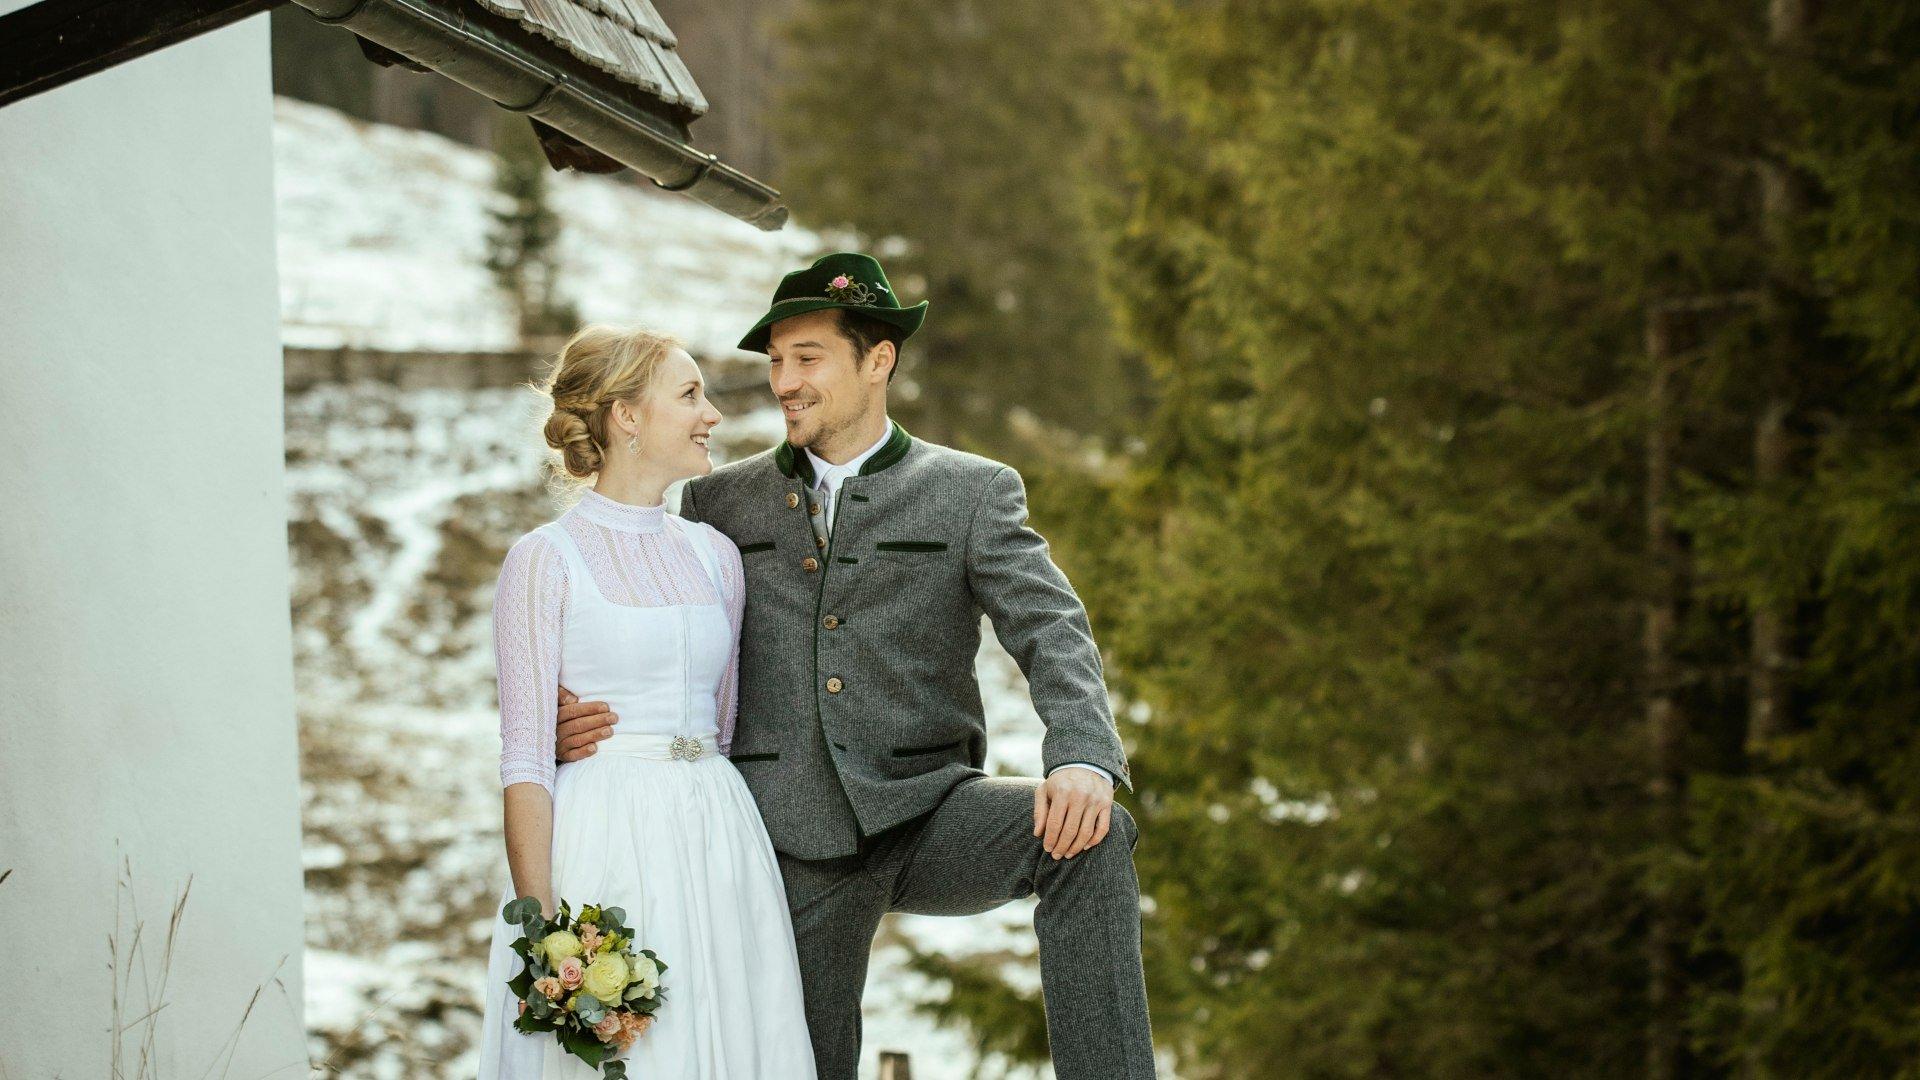 Heiraten am Tegernsee, © Hutmacherei Wiesner, Foto: Florian Bachmeier